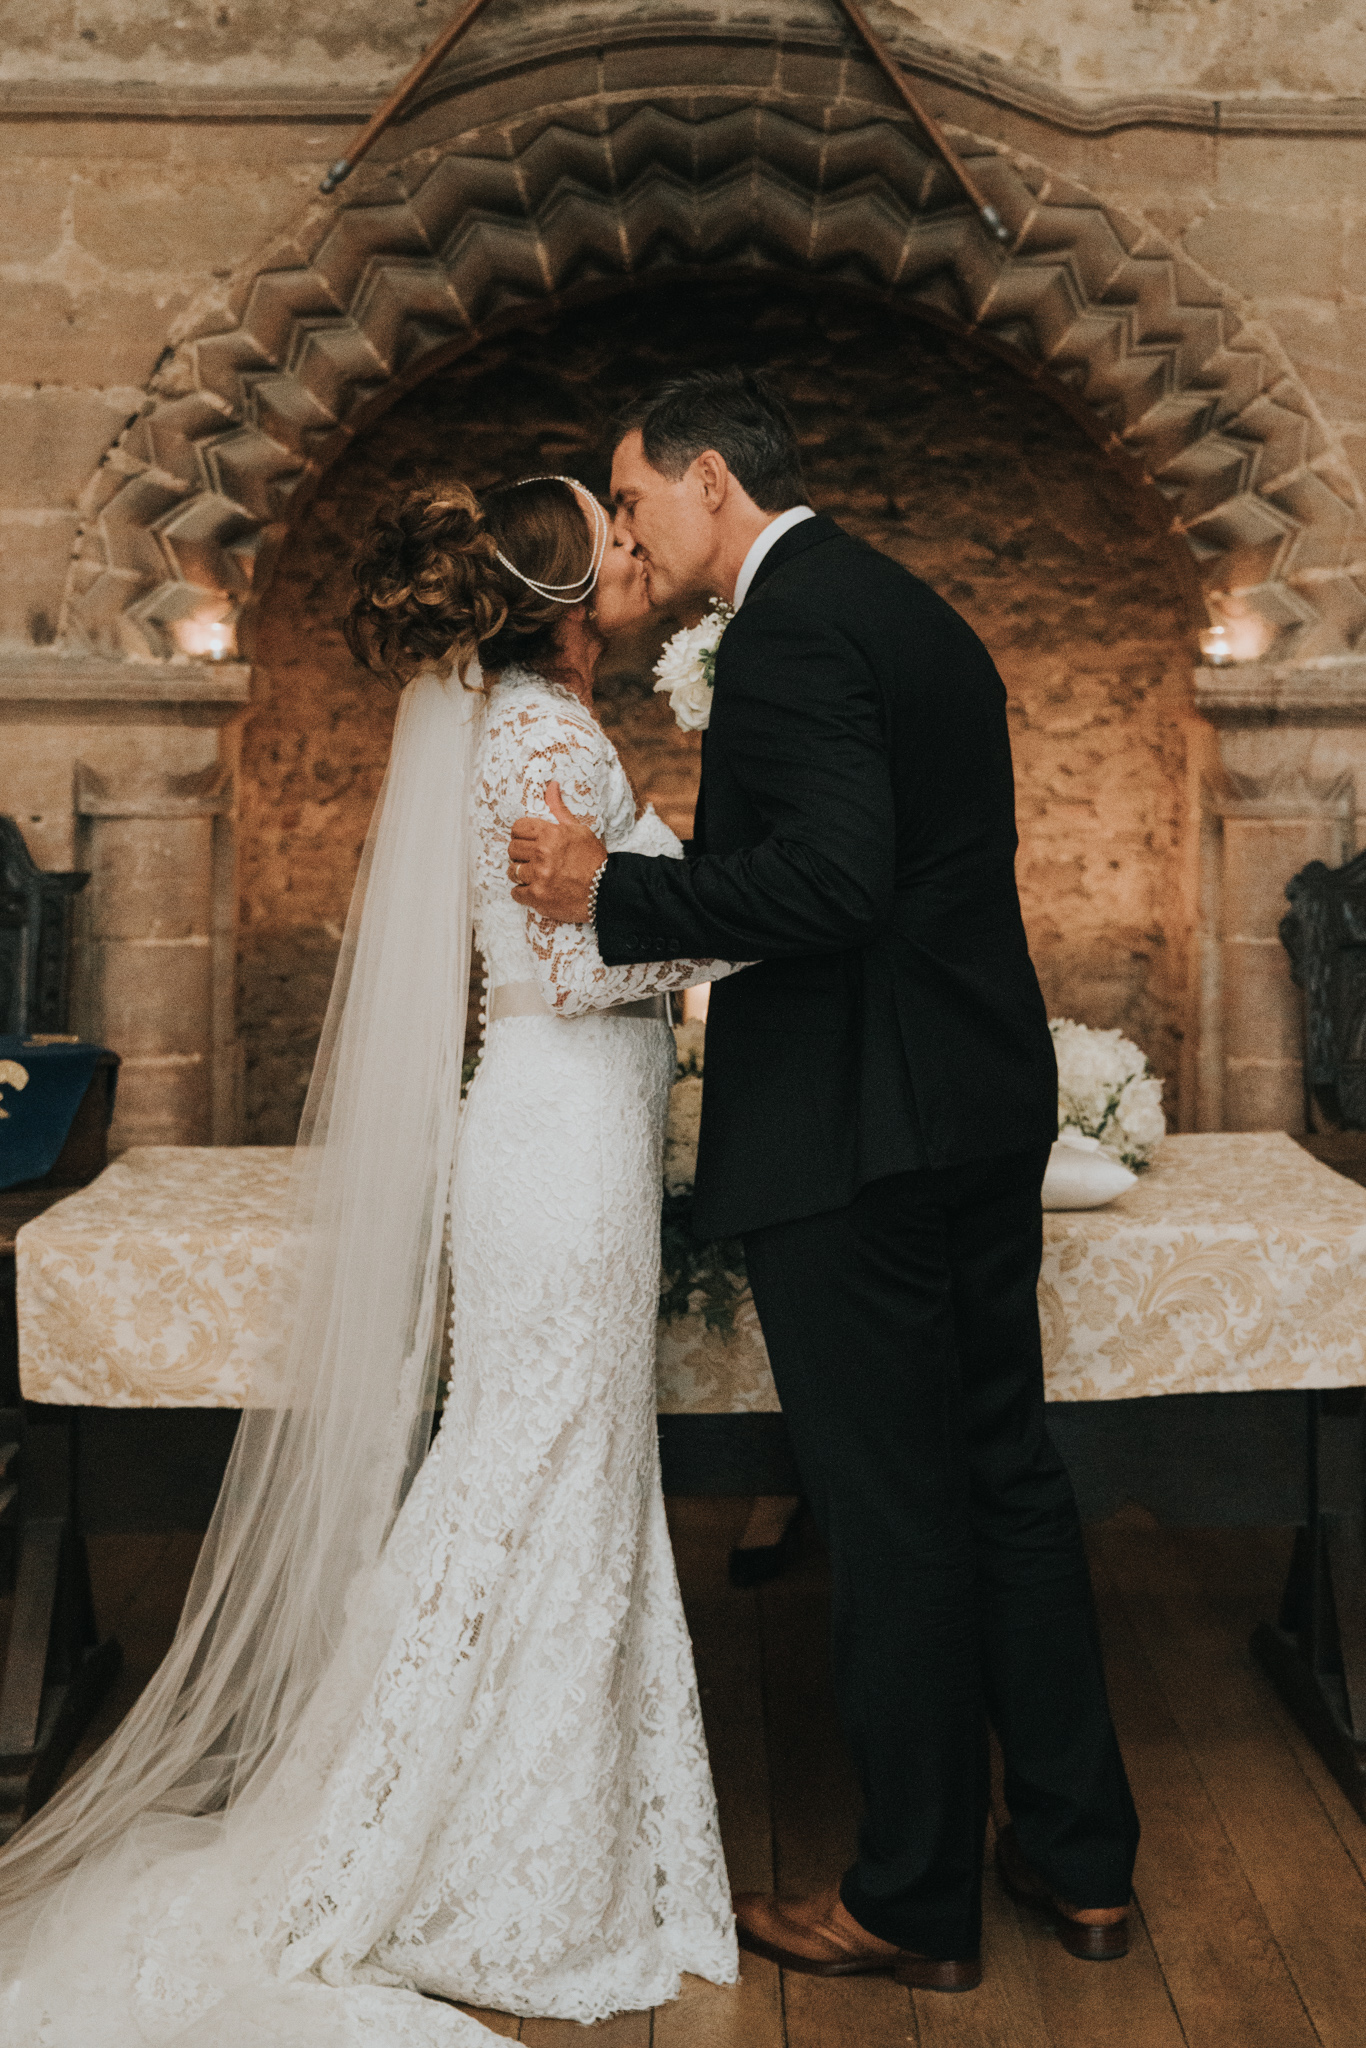 grace-elizabeth-boho-wedding-headingham-castle-essex-wedding-photographer-42.jpg